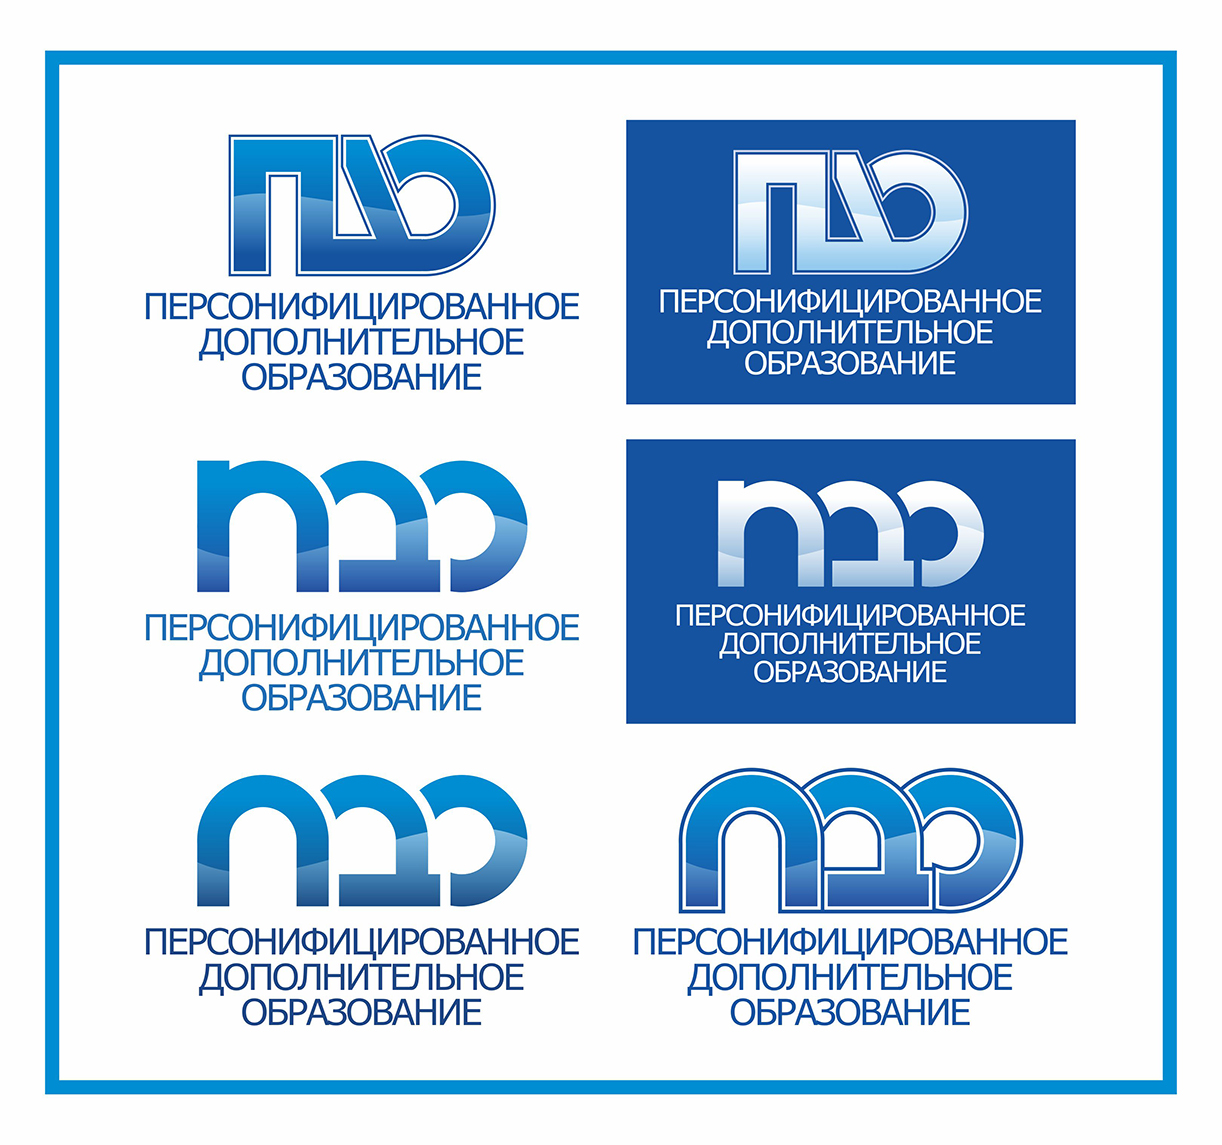 Логотип для интернет-портала фото f_5865a4fd992dcd9c.jpg